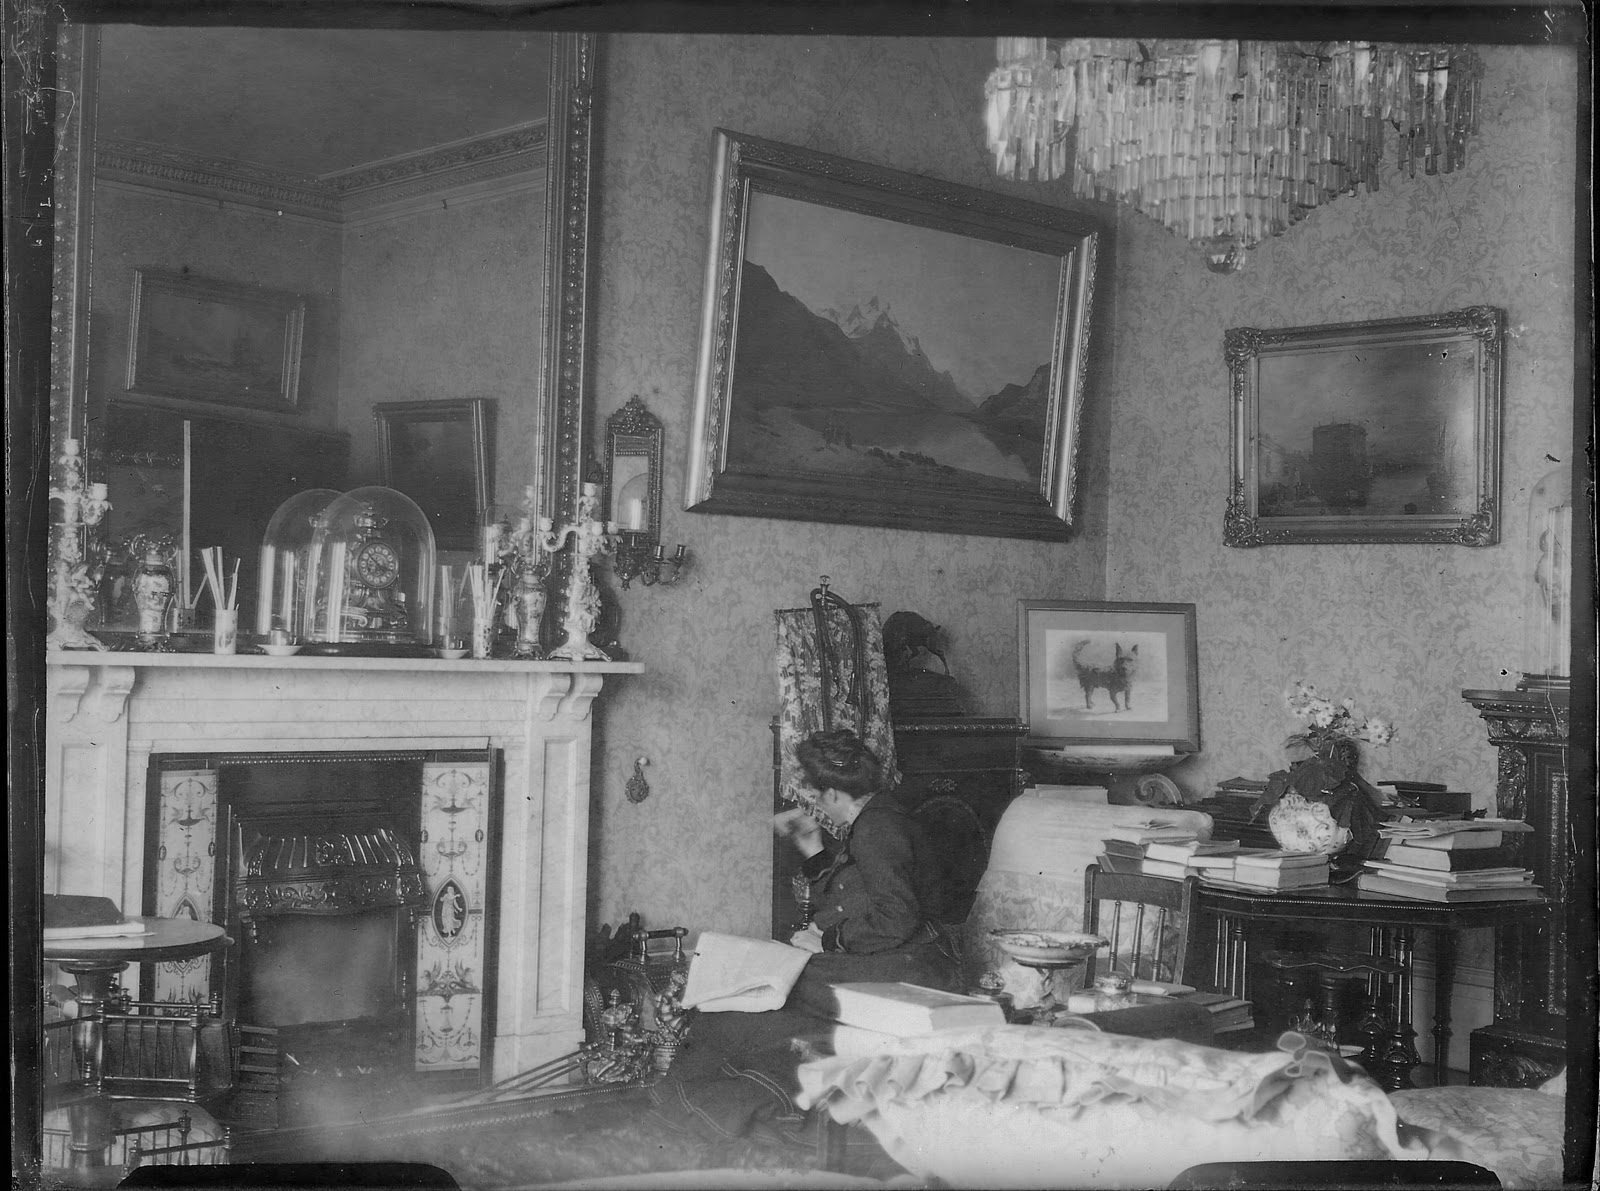 Daguerreian Dreams Edwardian Interiors - Edwardian house interiors